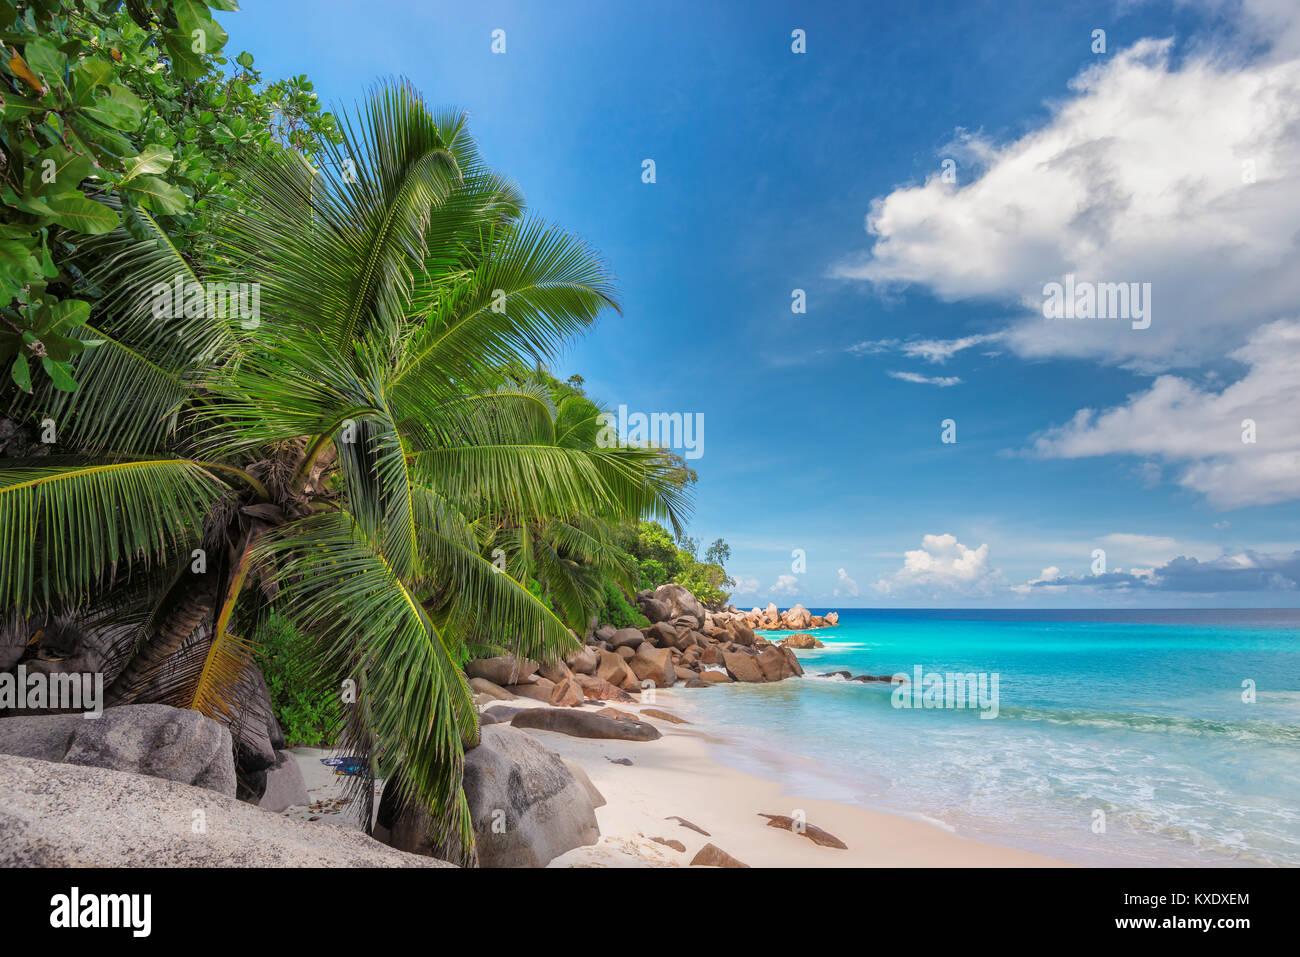 Paradise beach on Seychelles. - Stock Image